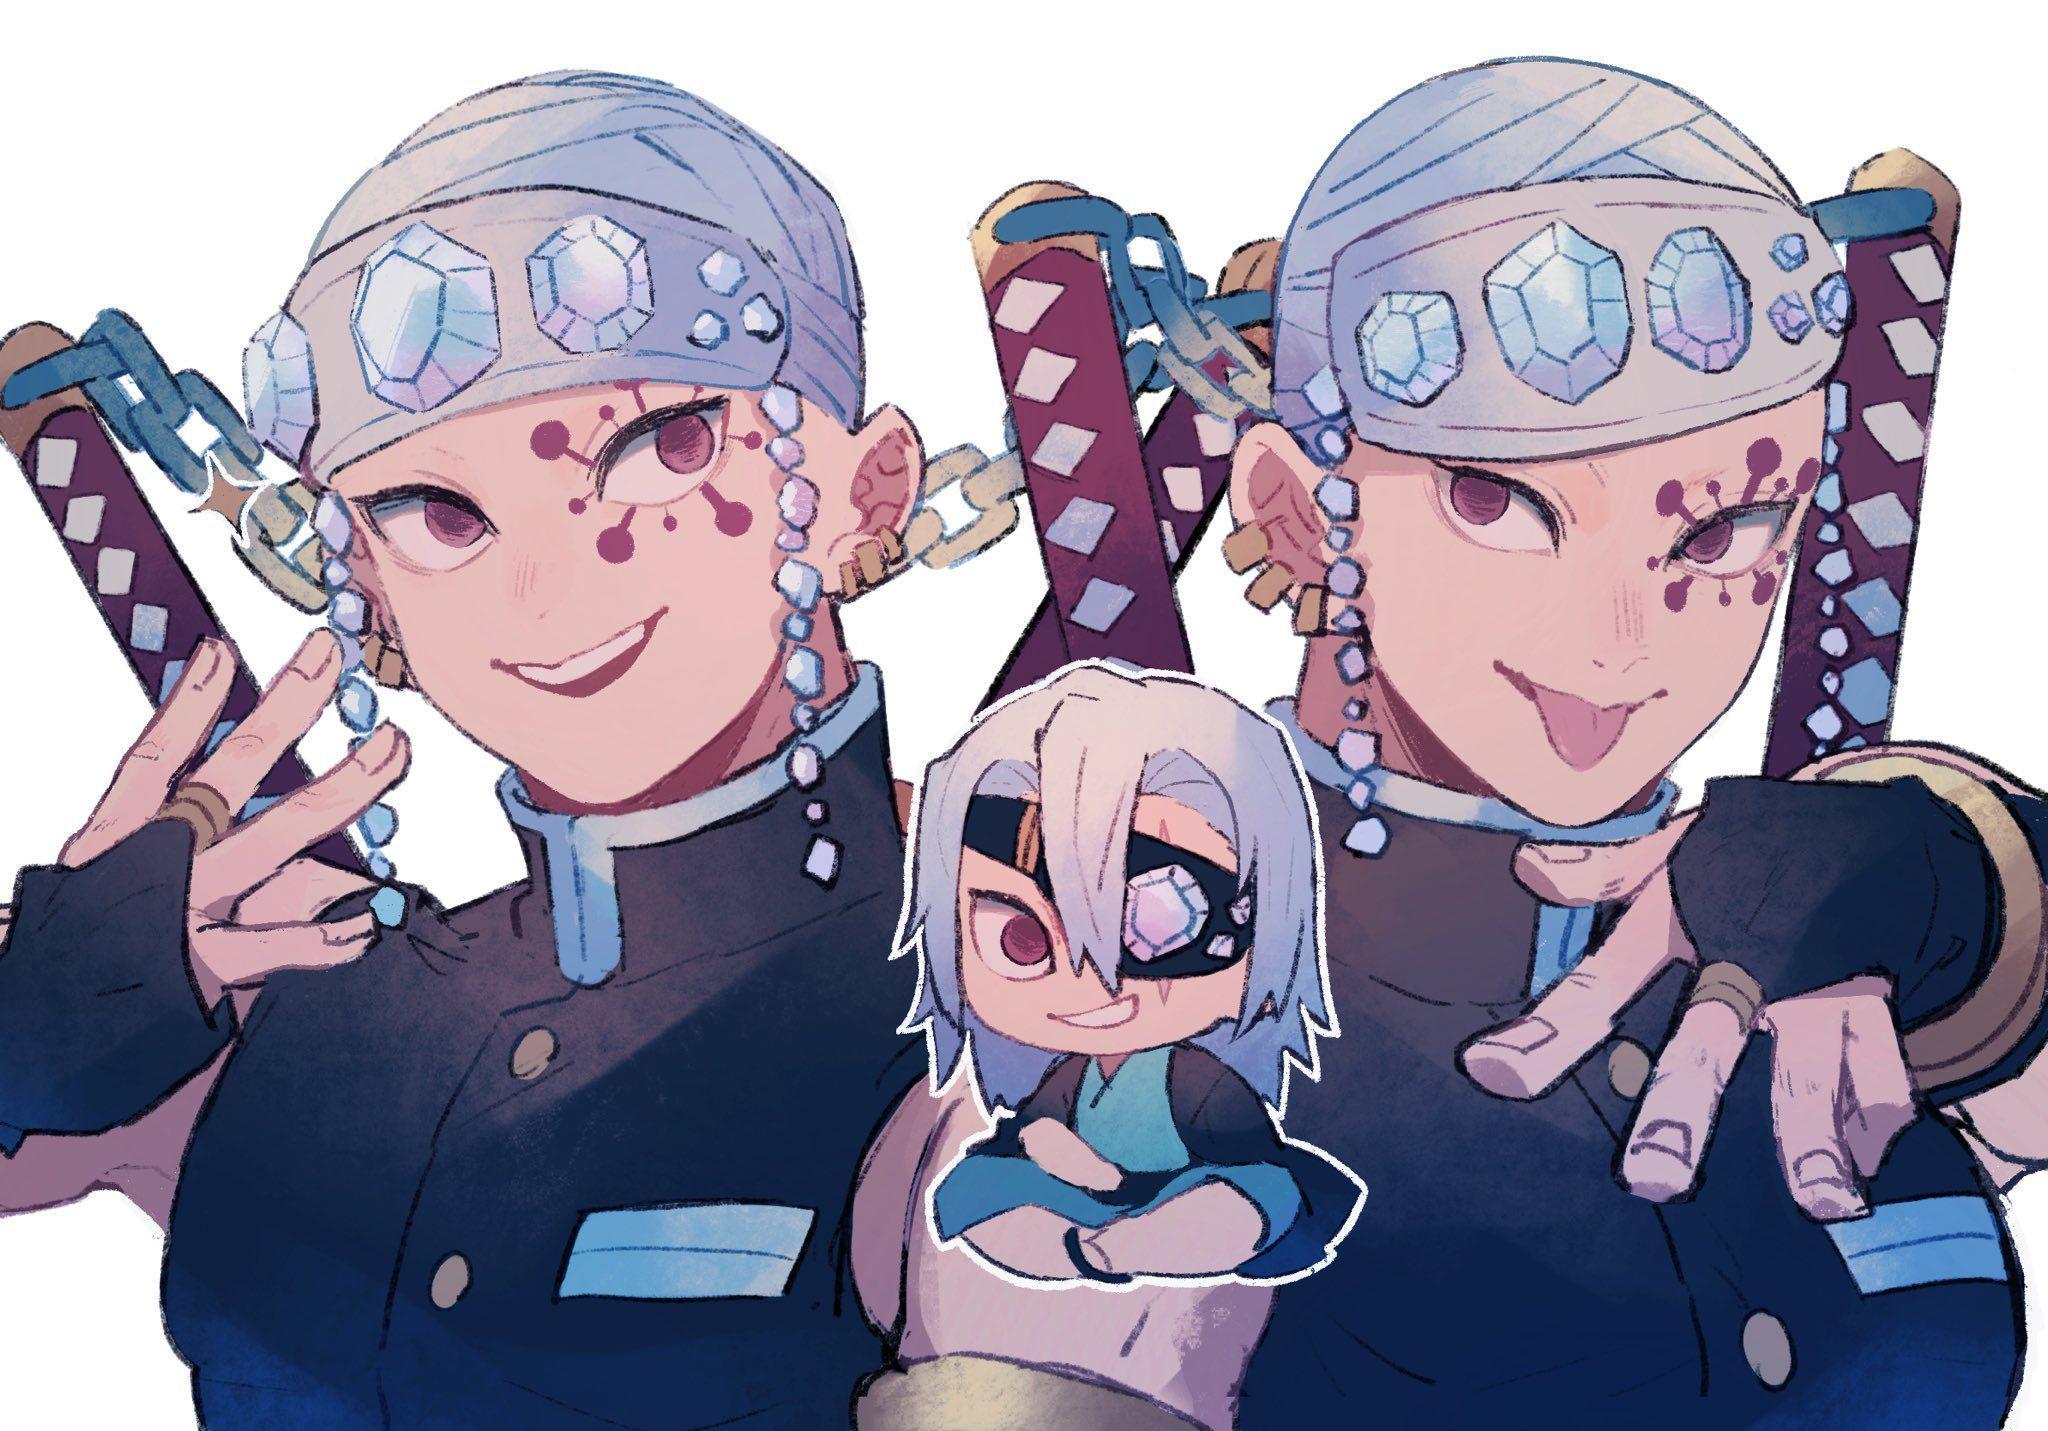 Uzui Tengen Fanart Uzui Tengen Fanart In 2020 Slayer Anime Anime Demon Anime Yandere pillars (pt.1) | kny uzui tengen, mitsuri kanroji, giyuu tomioka, sanemi shinazugawa, kyoujurou rengoku part 2 slayer anime anime demon anime